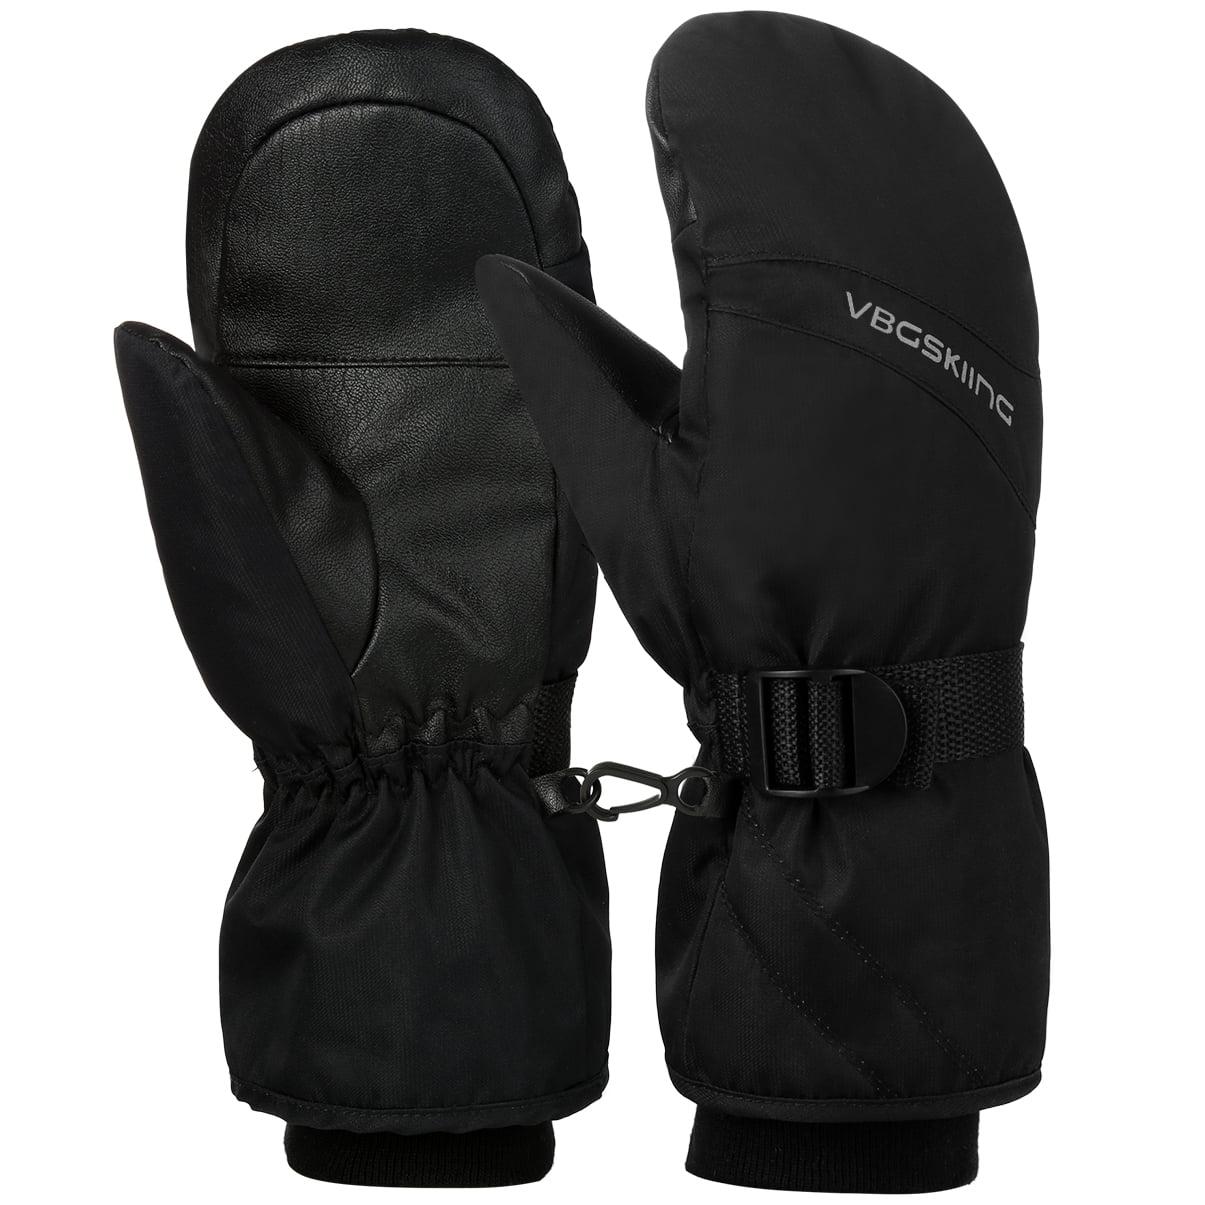 Waterproof Ski Gloves, Vbiger Winter Warm Thinsulate Snowboard Snowmobile Cold Weather Gloves